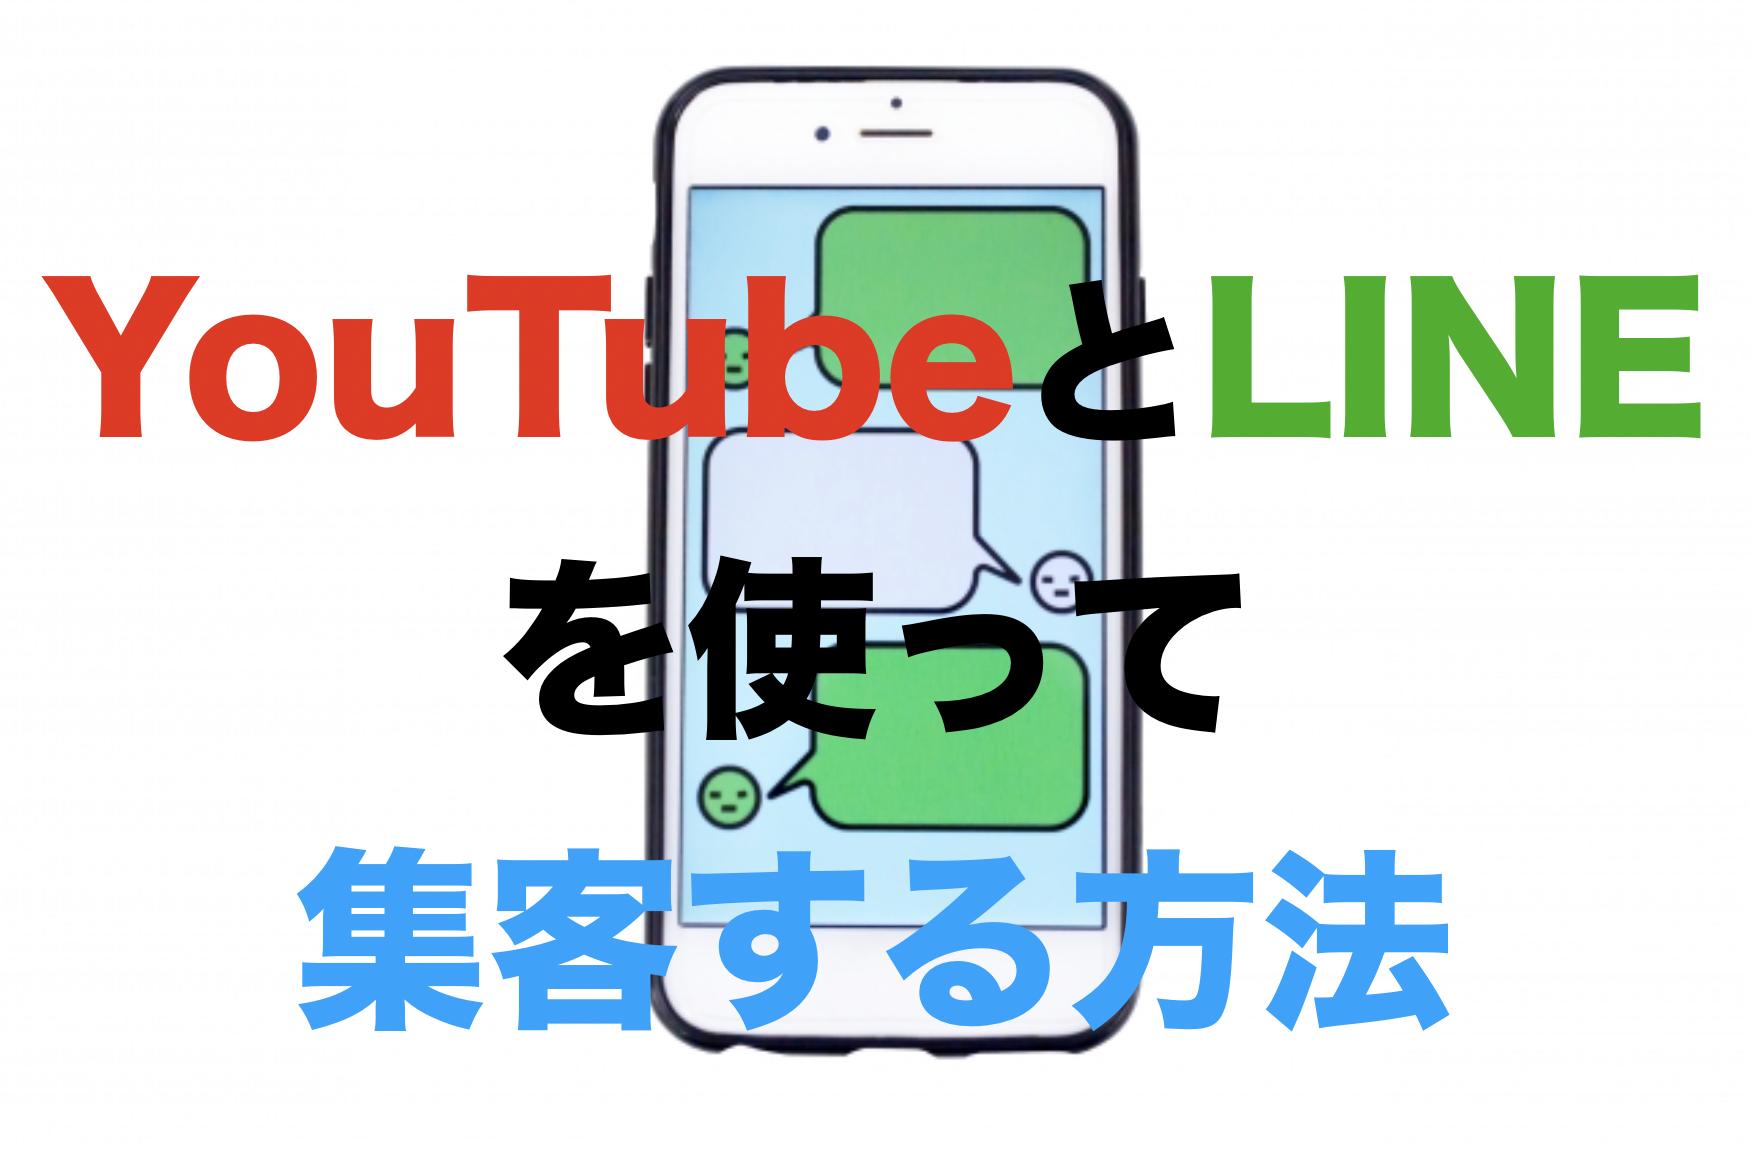 YouTubeとLINEを使って集客する方法